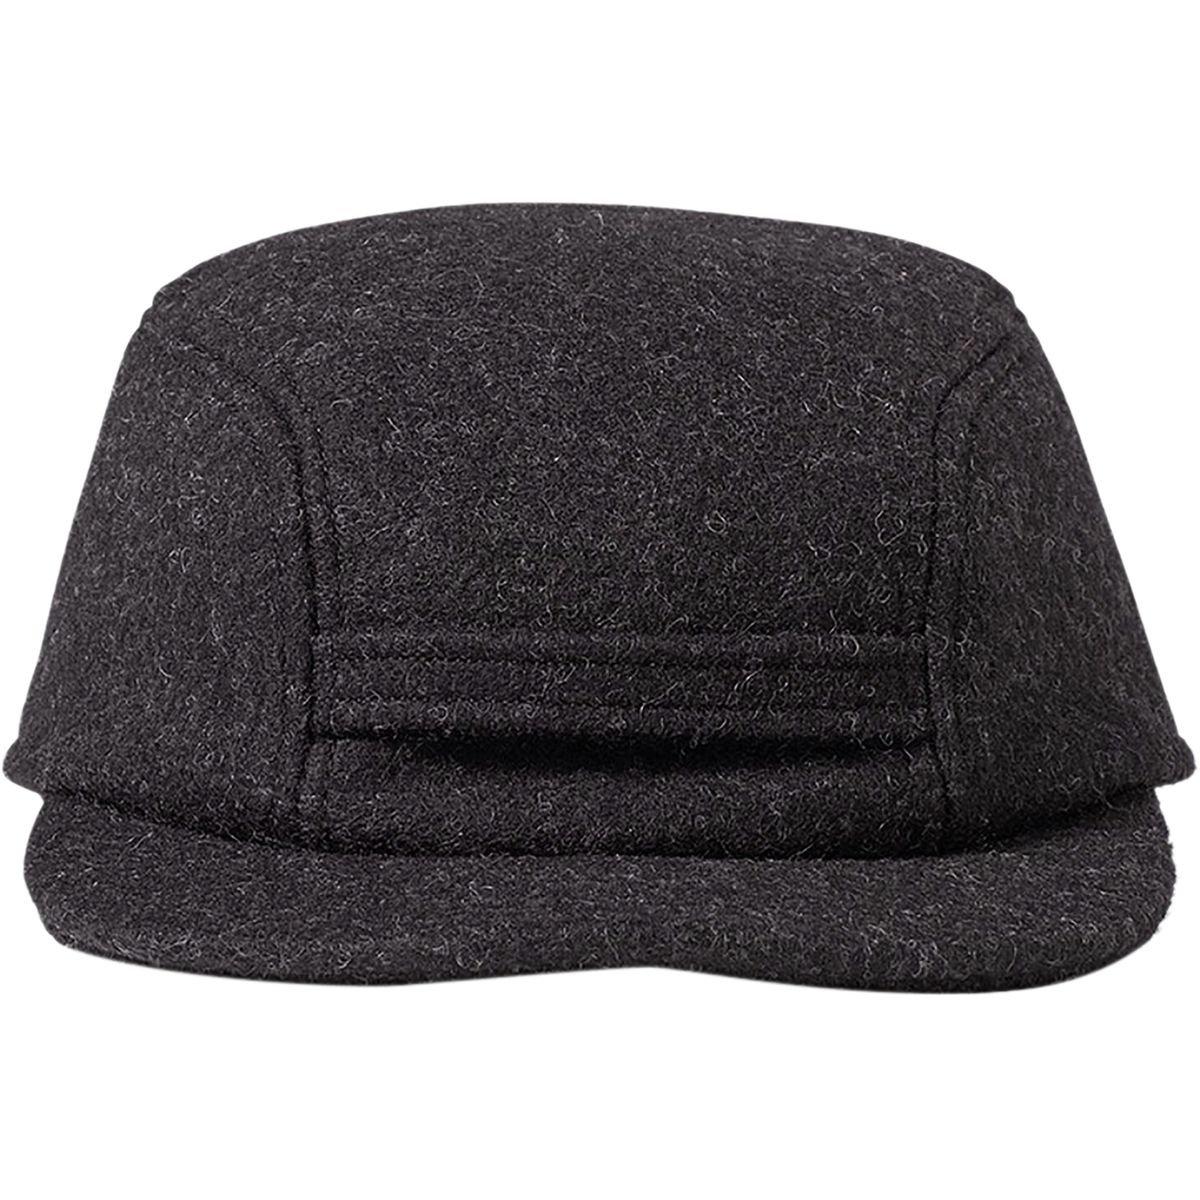 532d4333424 Filson Mackinaw Wool Cap (Charcoal